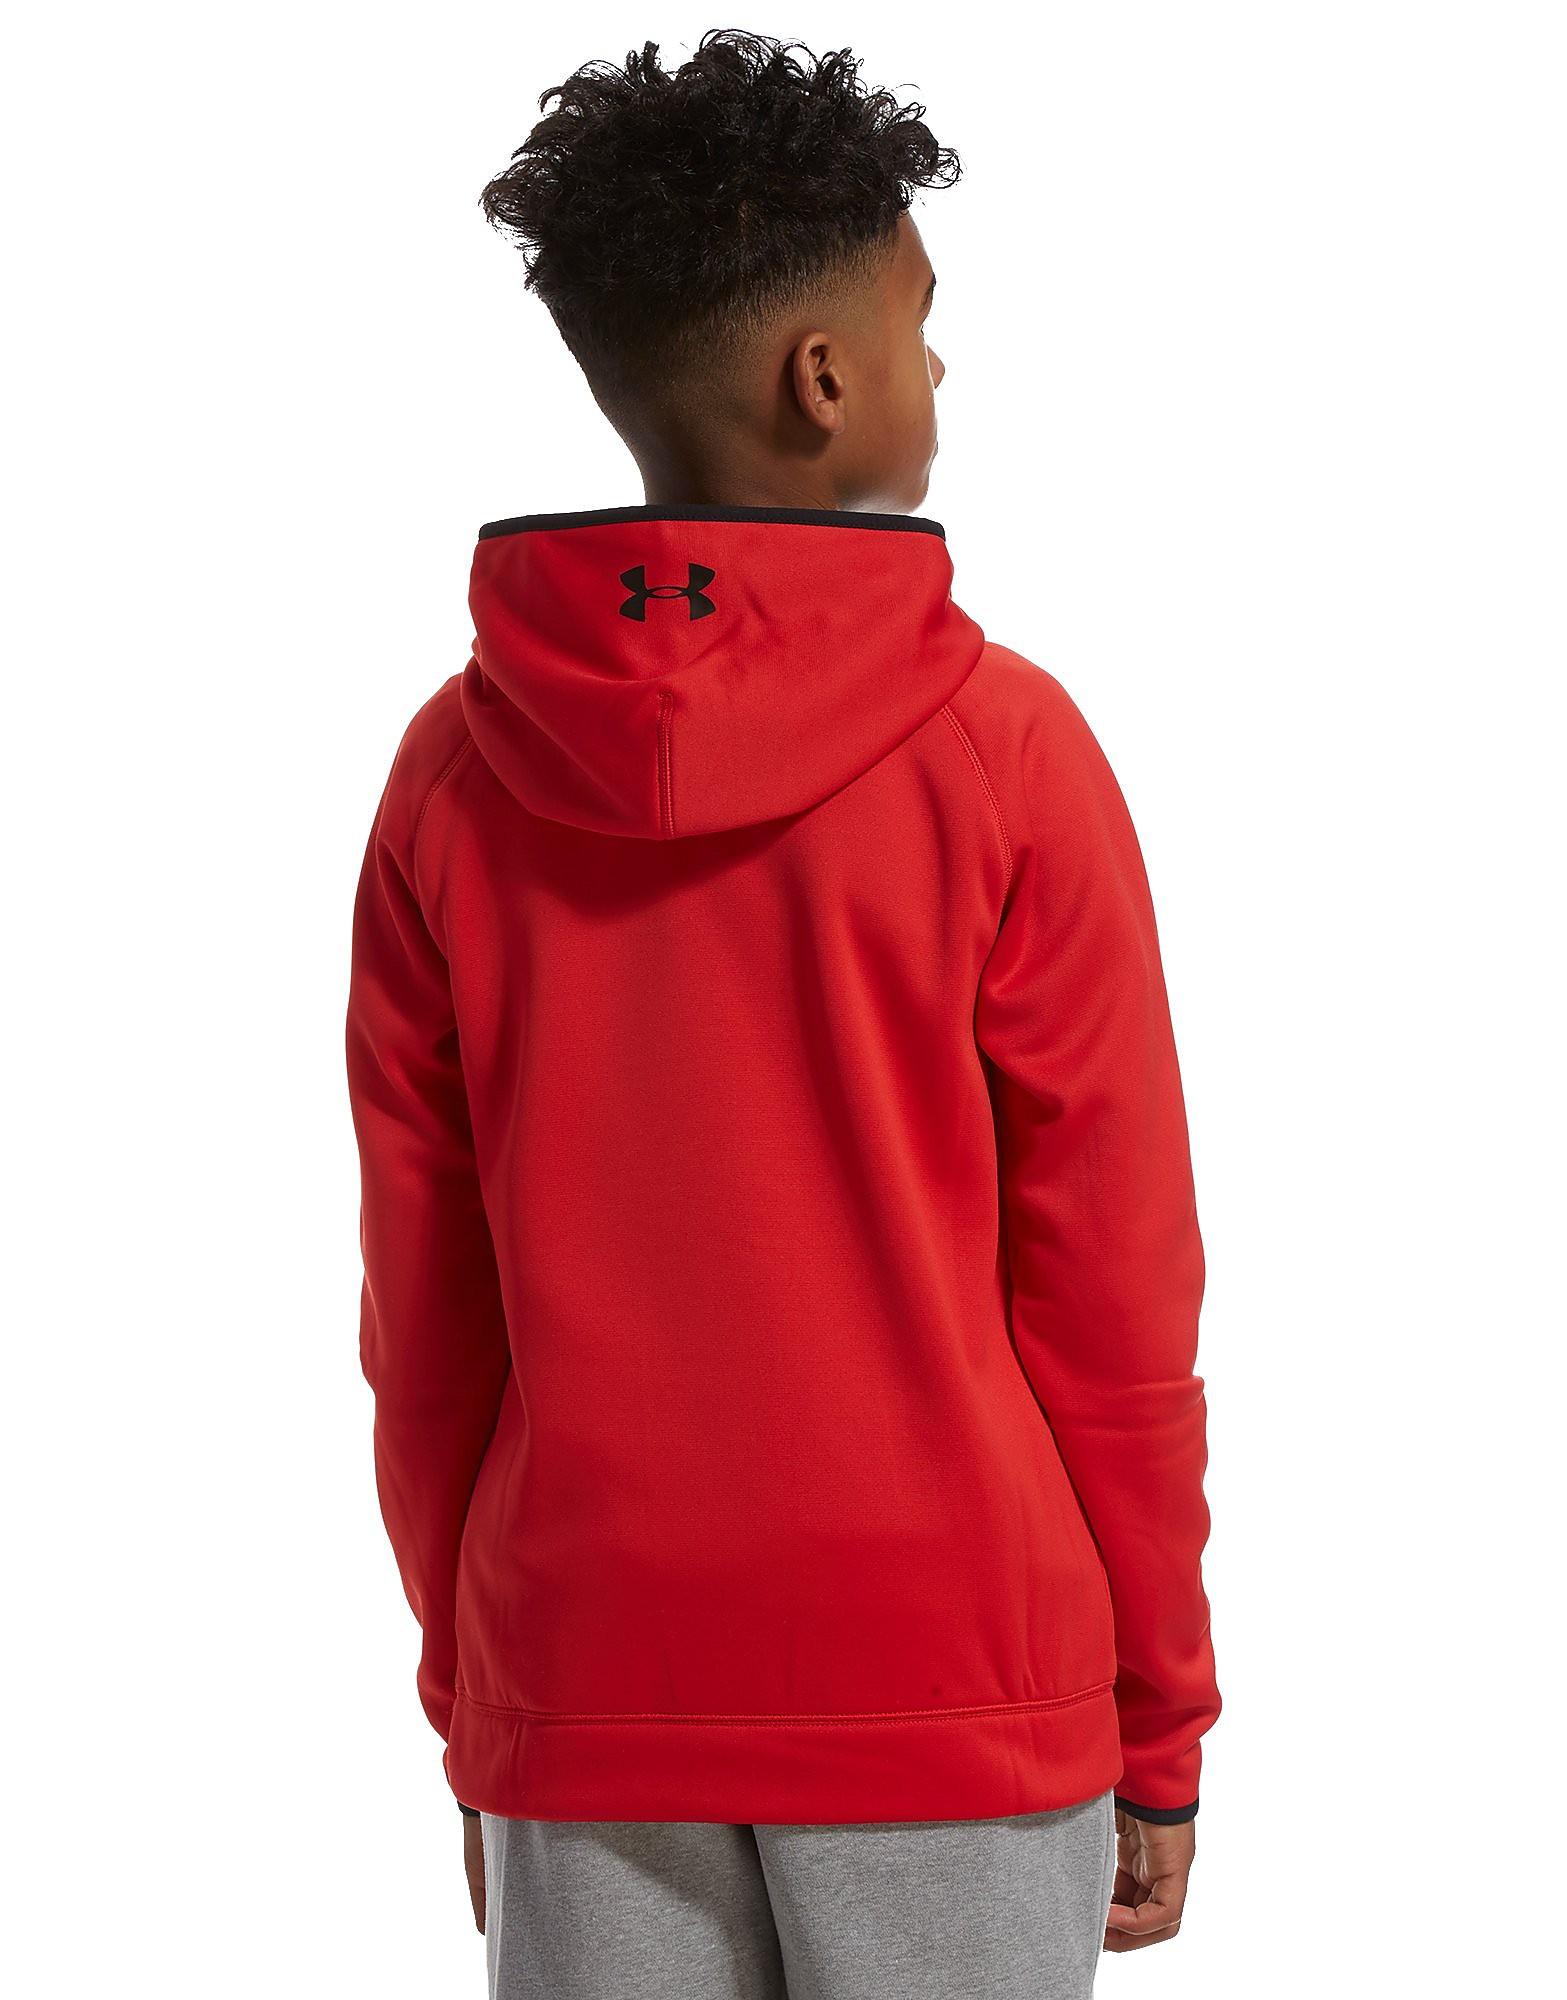 Under Armour Fleece Big Logo Hoodie Junior